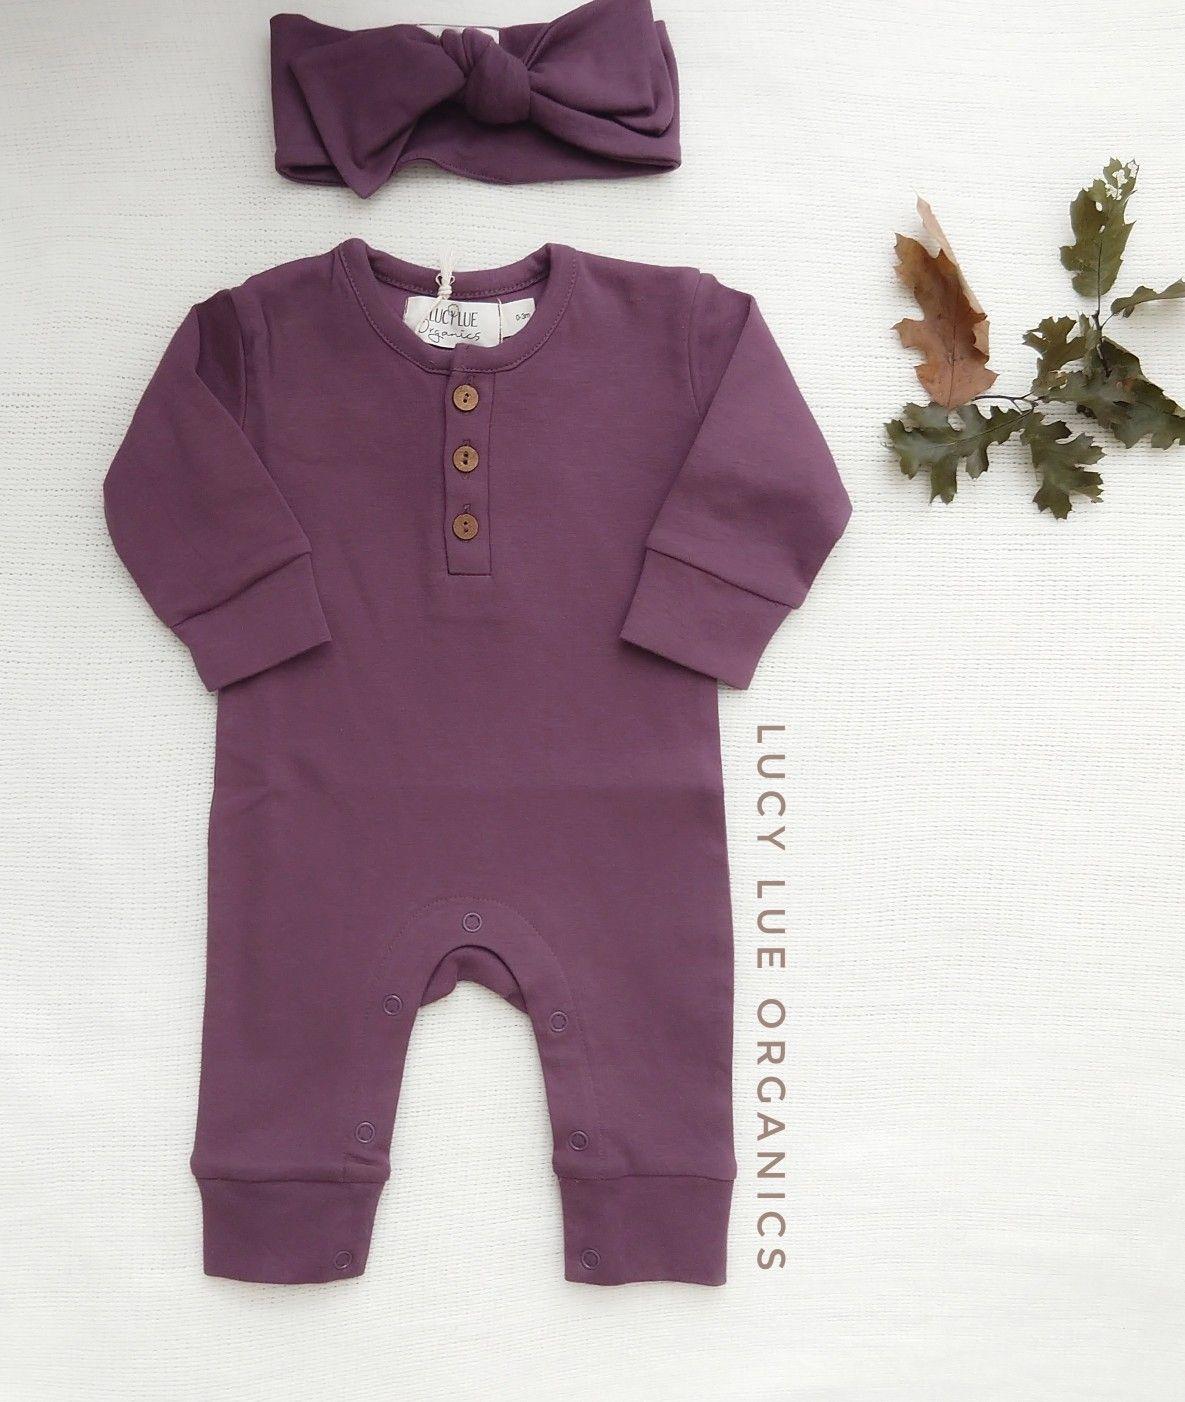 , #trendy baby clothing organic long sleeve romper | plum, My Babies Blog 2020, My Babies Blog 2020